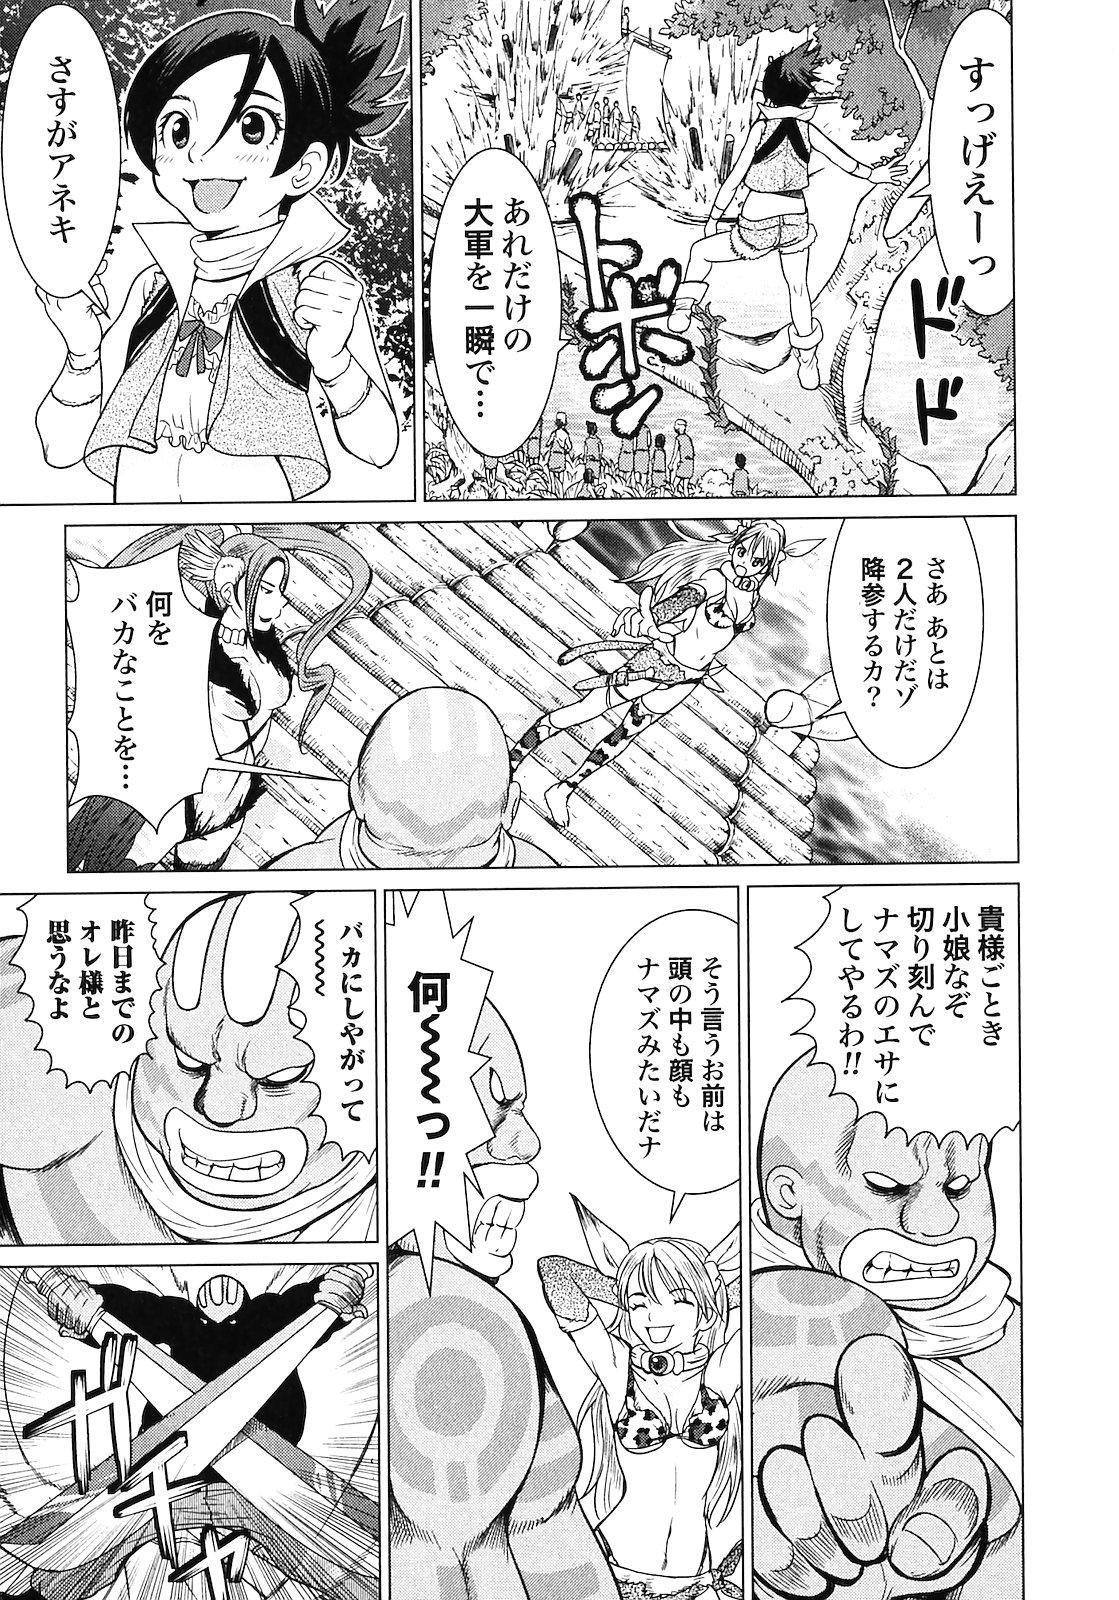 Makyo no Shanana Vol.02 50